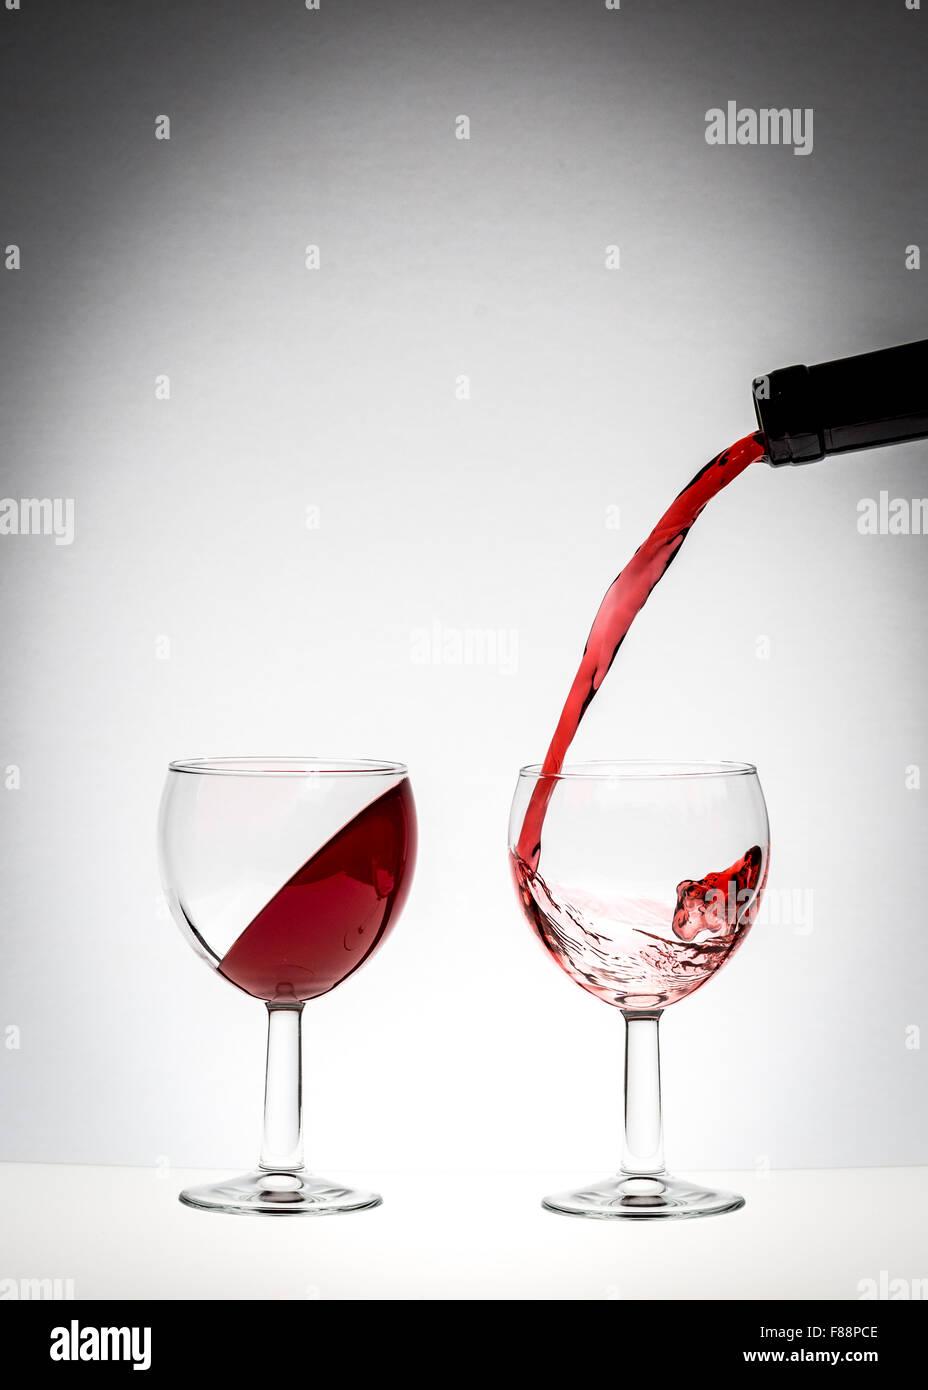 Gravity defying wine - Stock Image